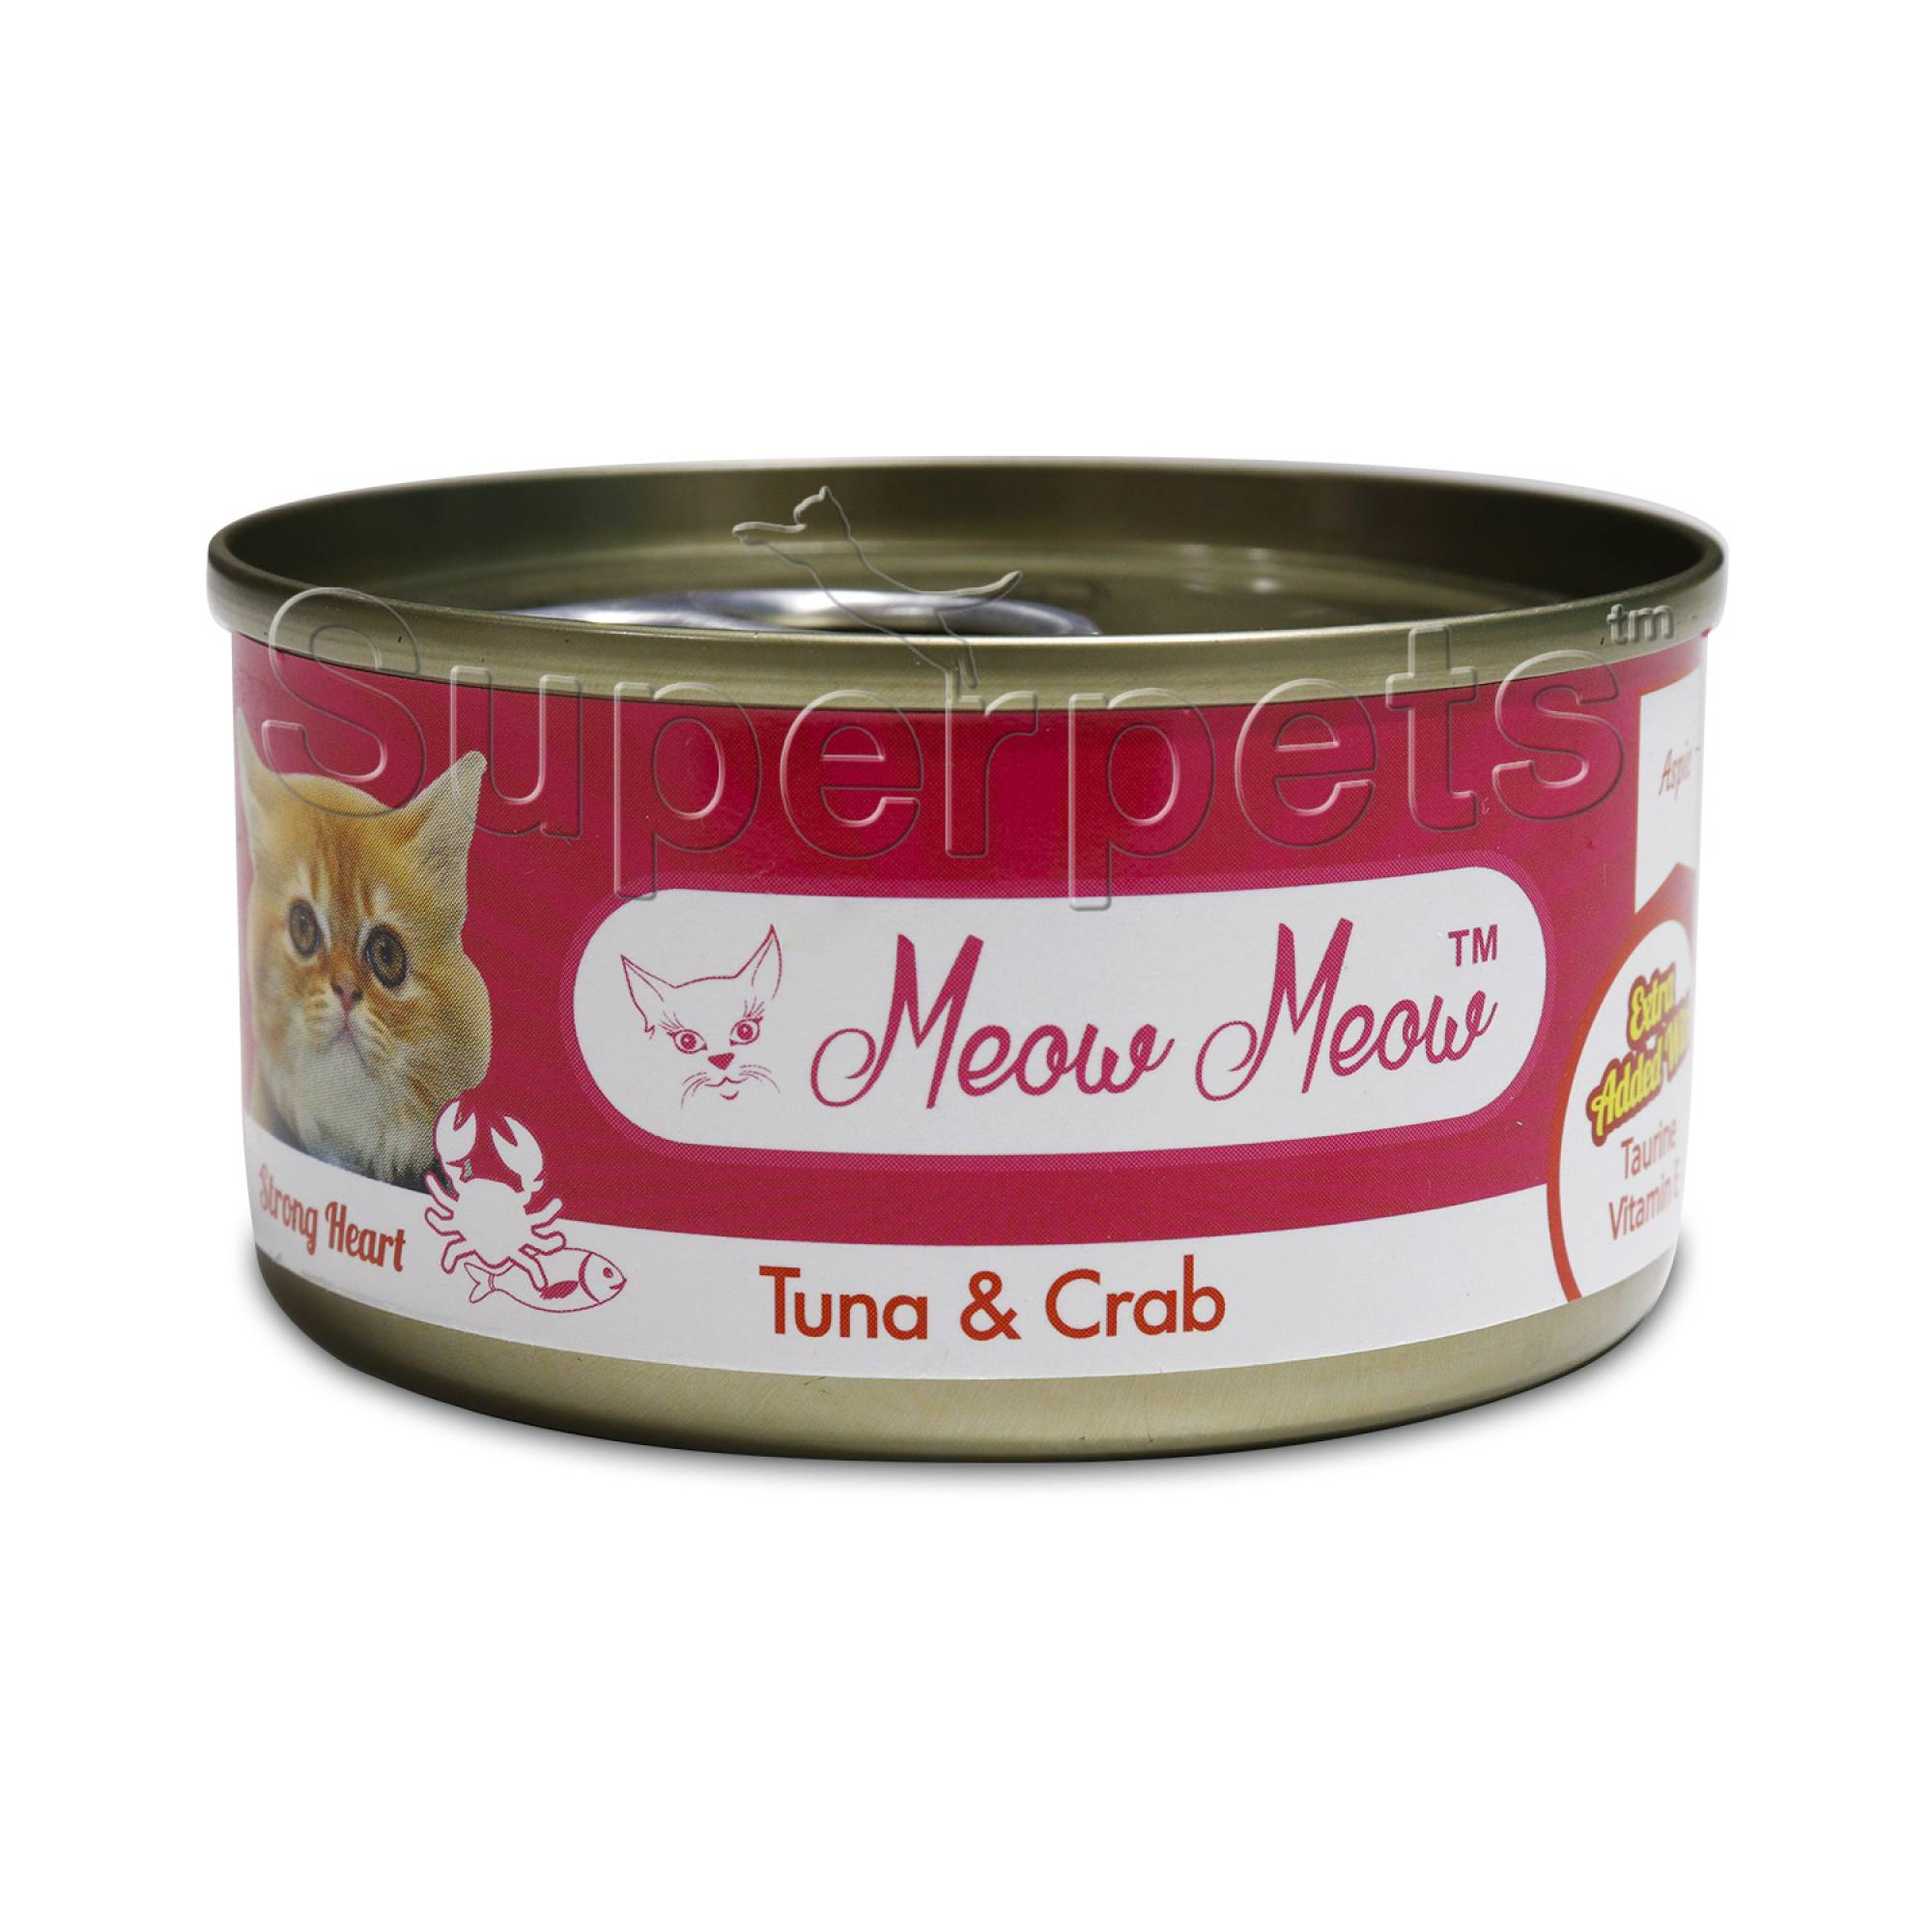 Meow Meow - Tuna & Crab - Grain Free 80g x 24pcs (1 carton)